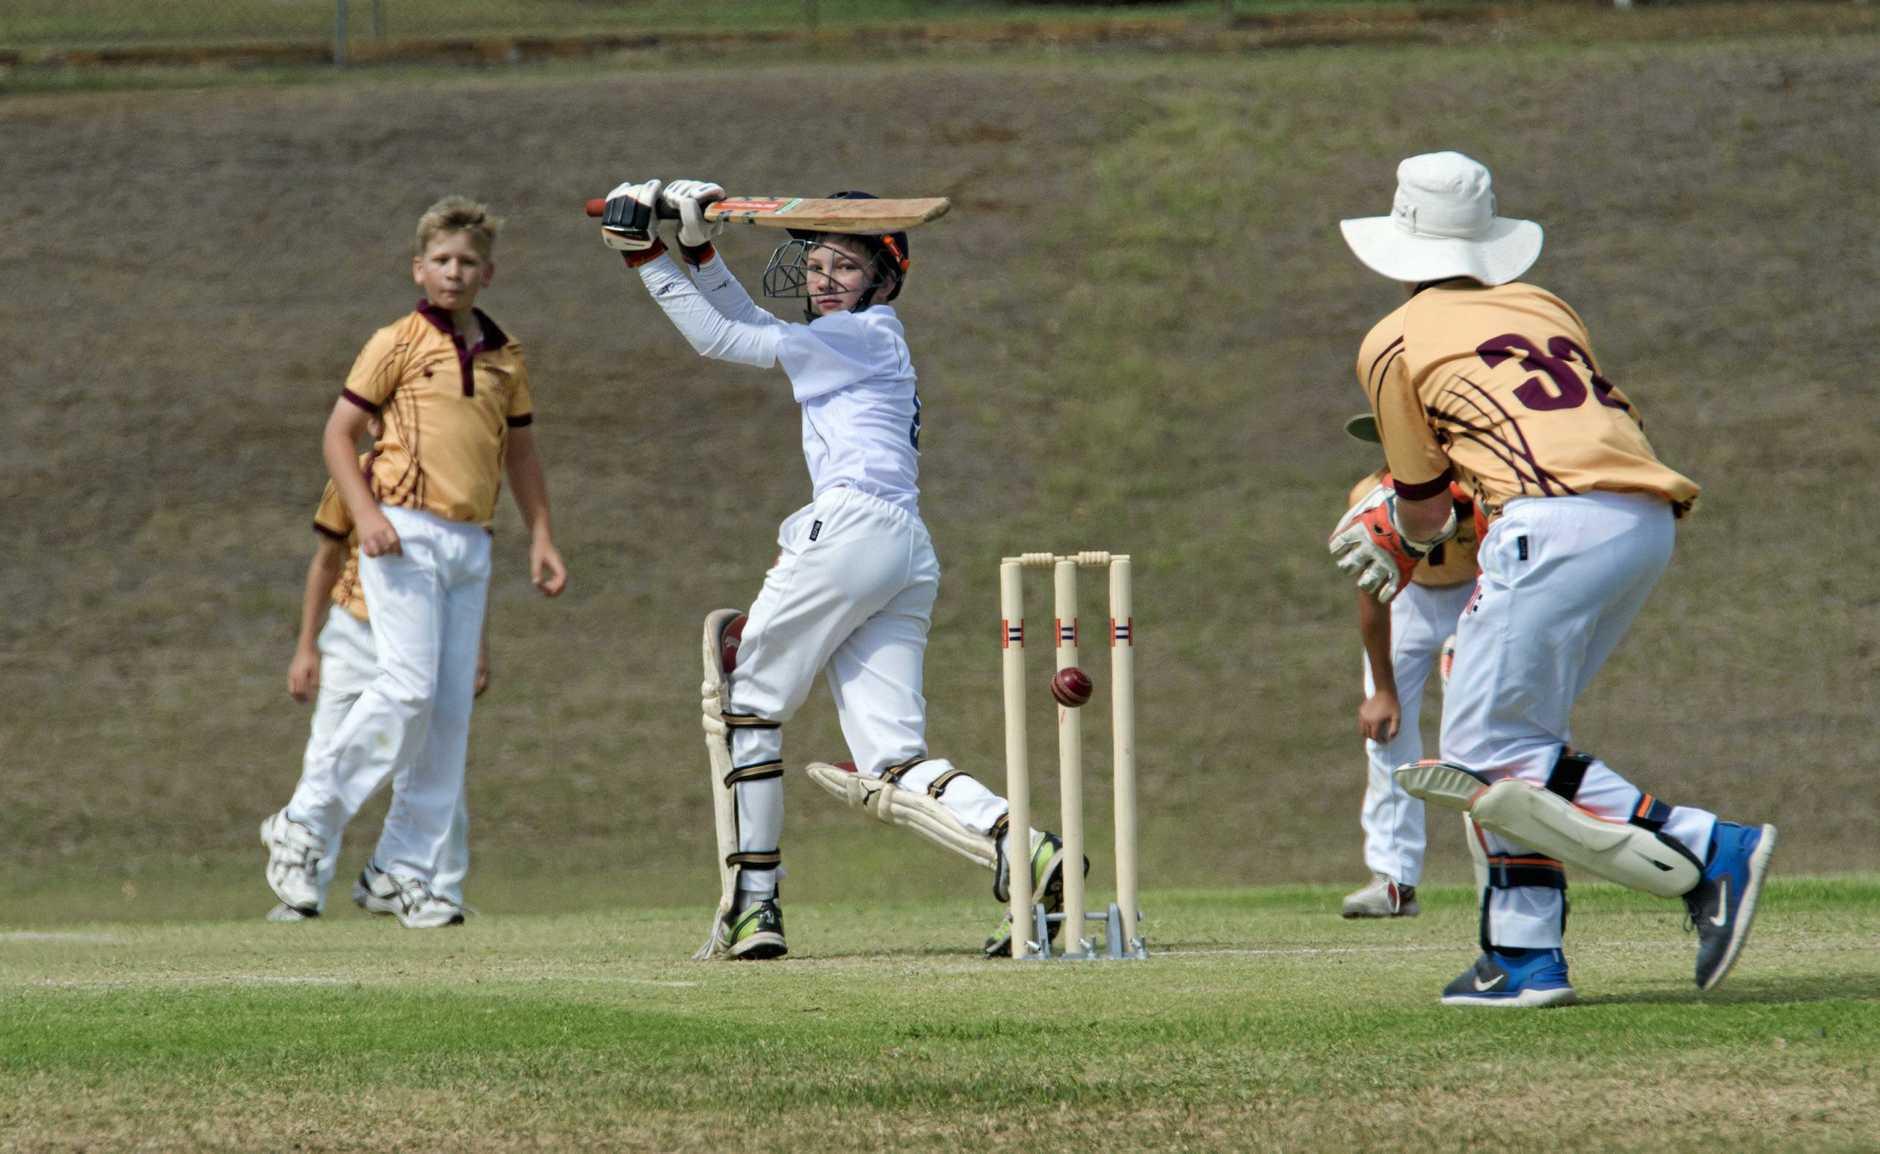 Norths batsmen Sam Burke plays one behind the stumps.